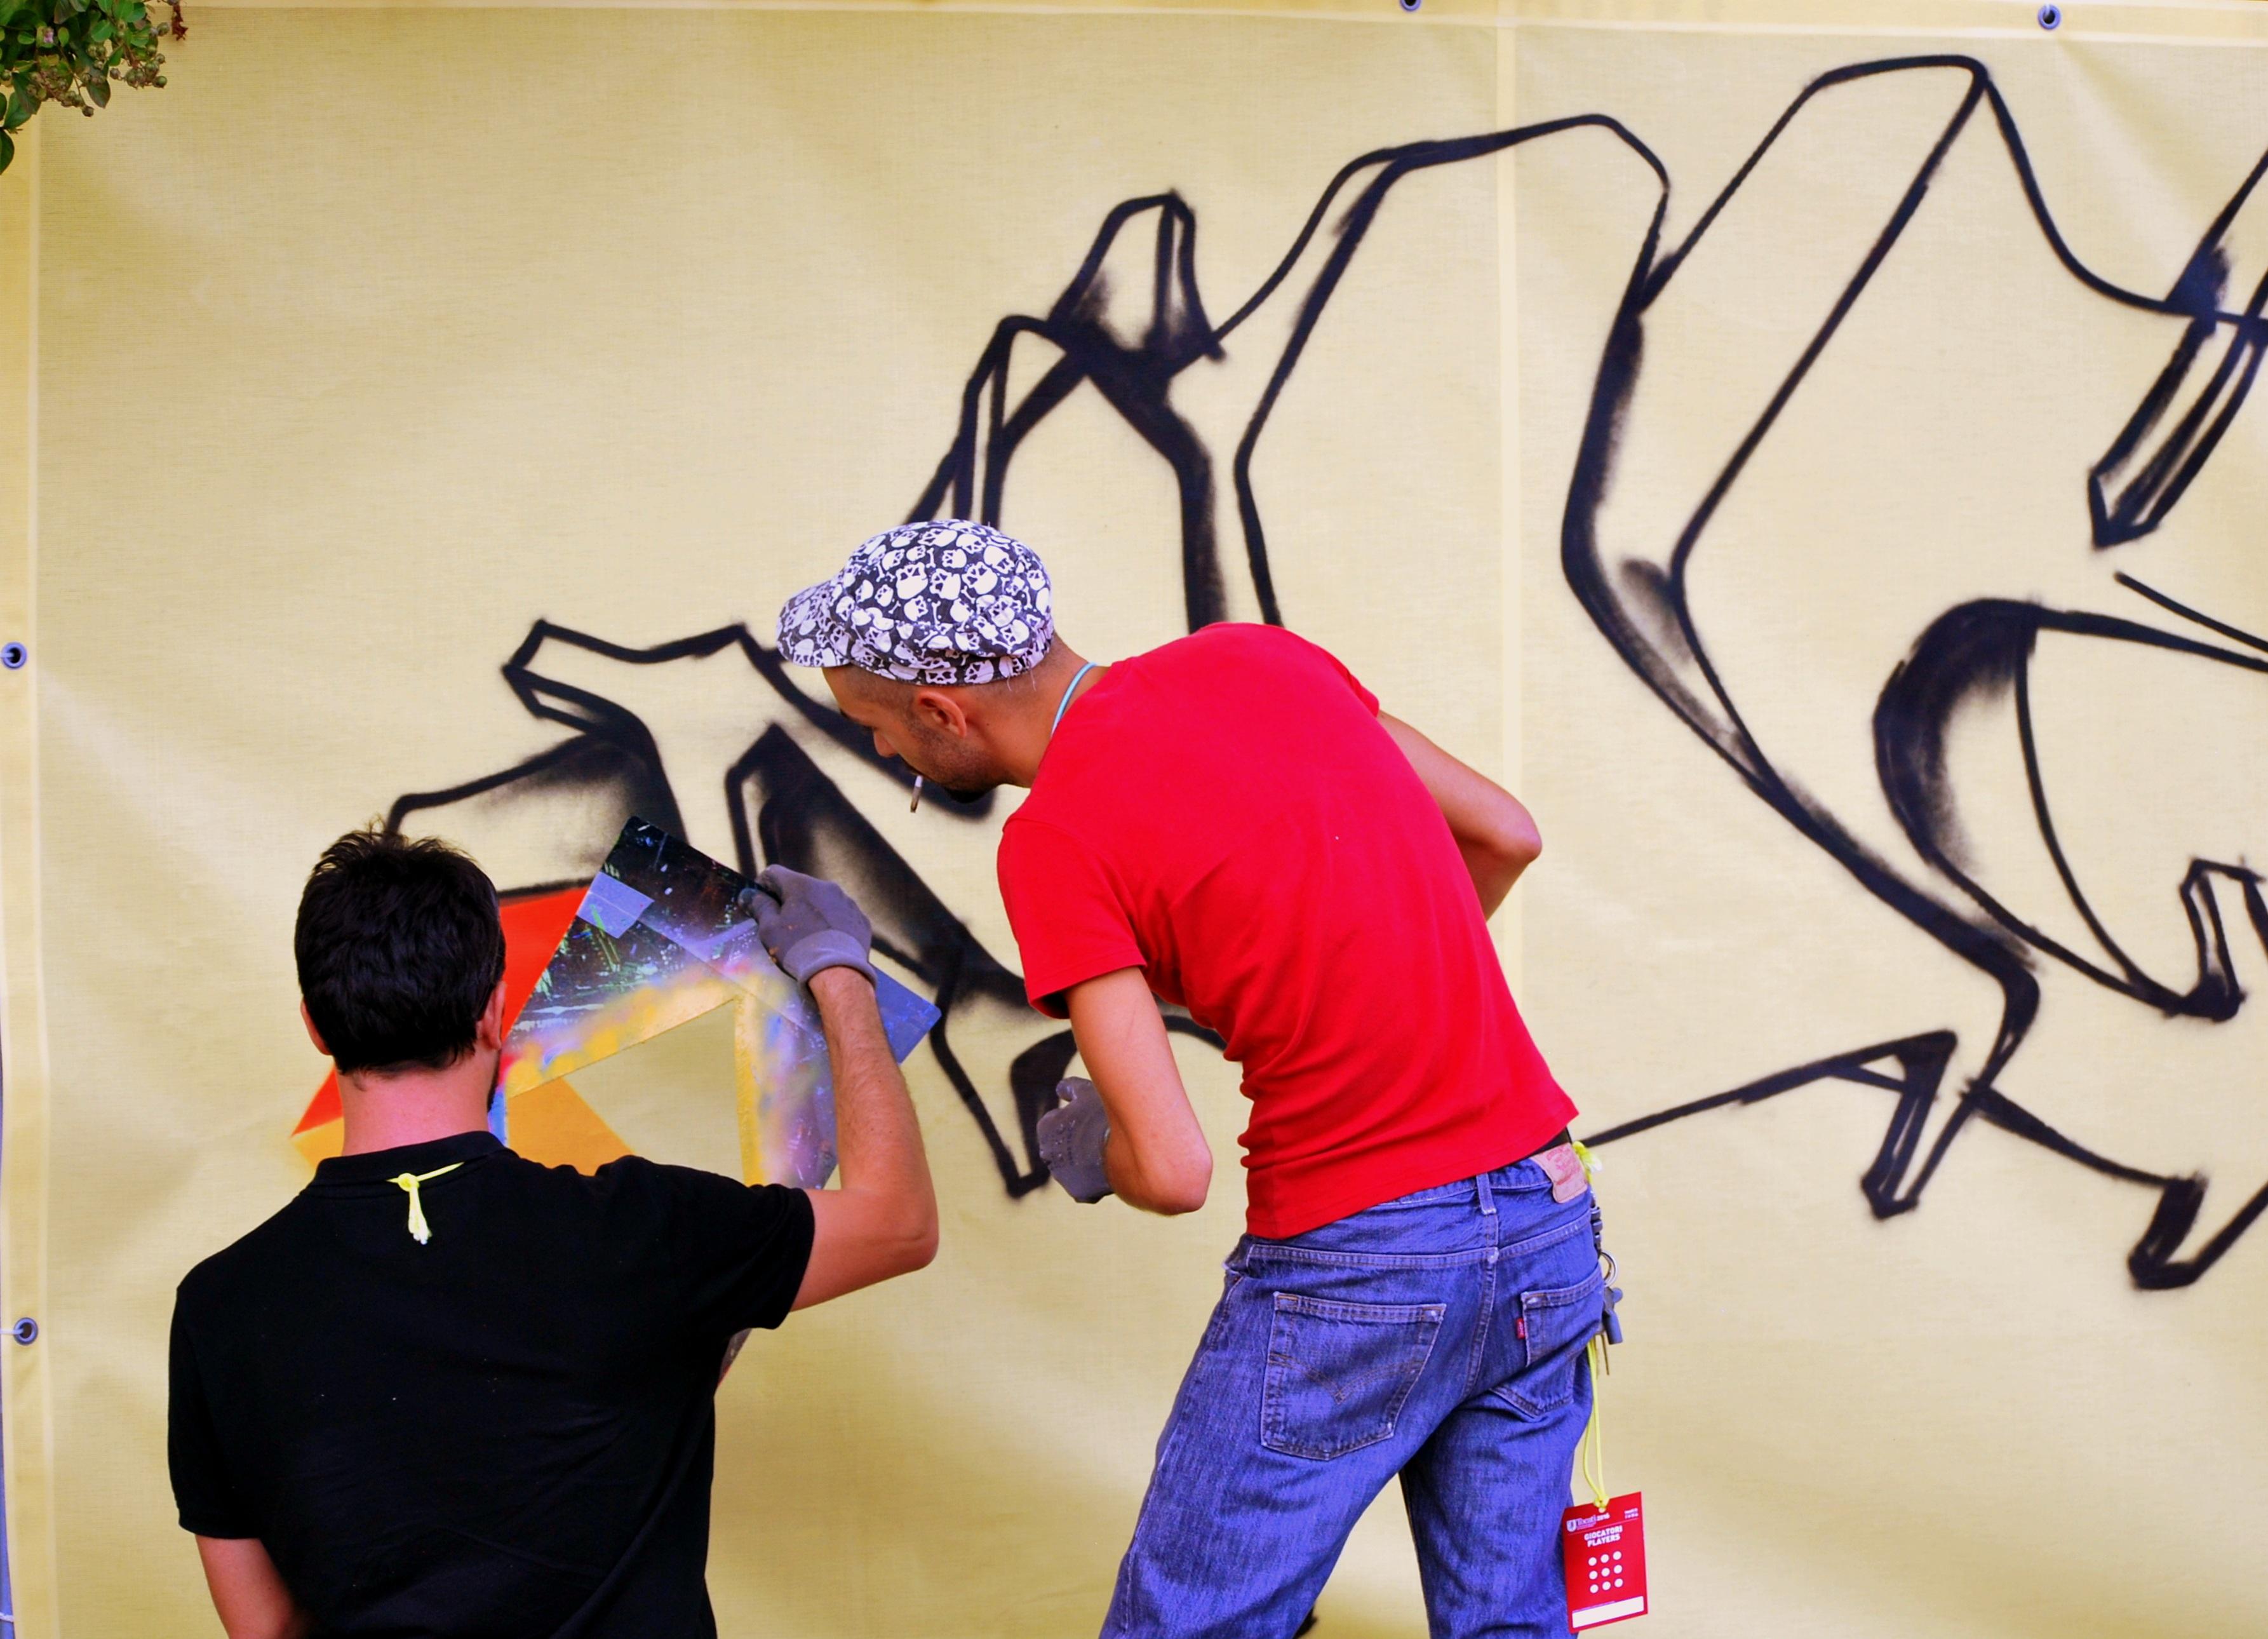 Free Images Game Spray Italy Graffiti Art Fun Design Mural Verona Draw Tocat Writes Human Behavior 3571x2580 491256 Free Stock Photos Pxhere